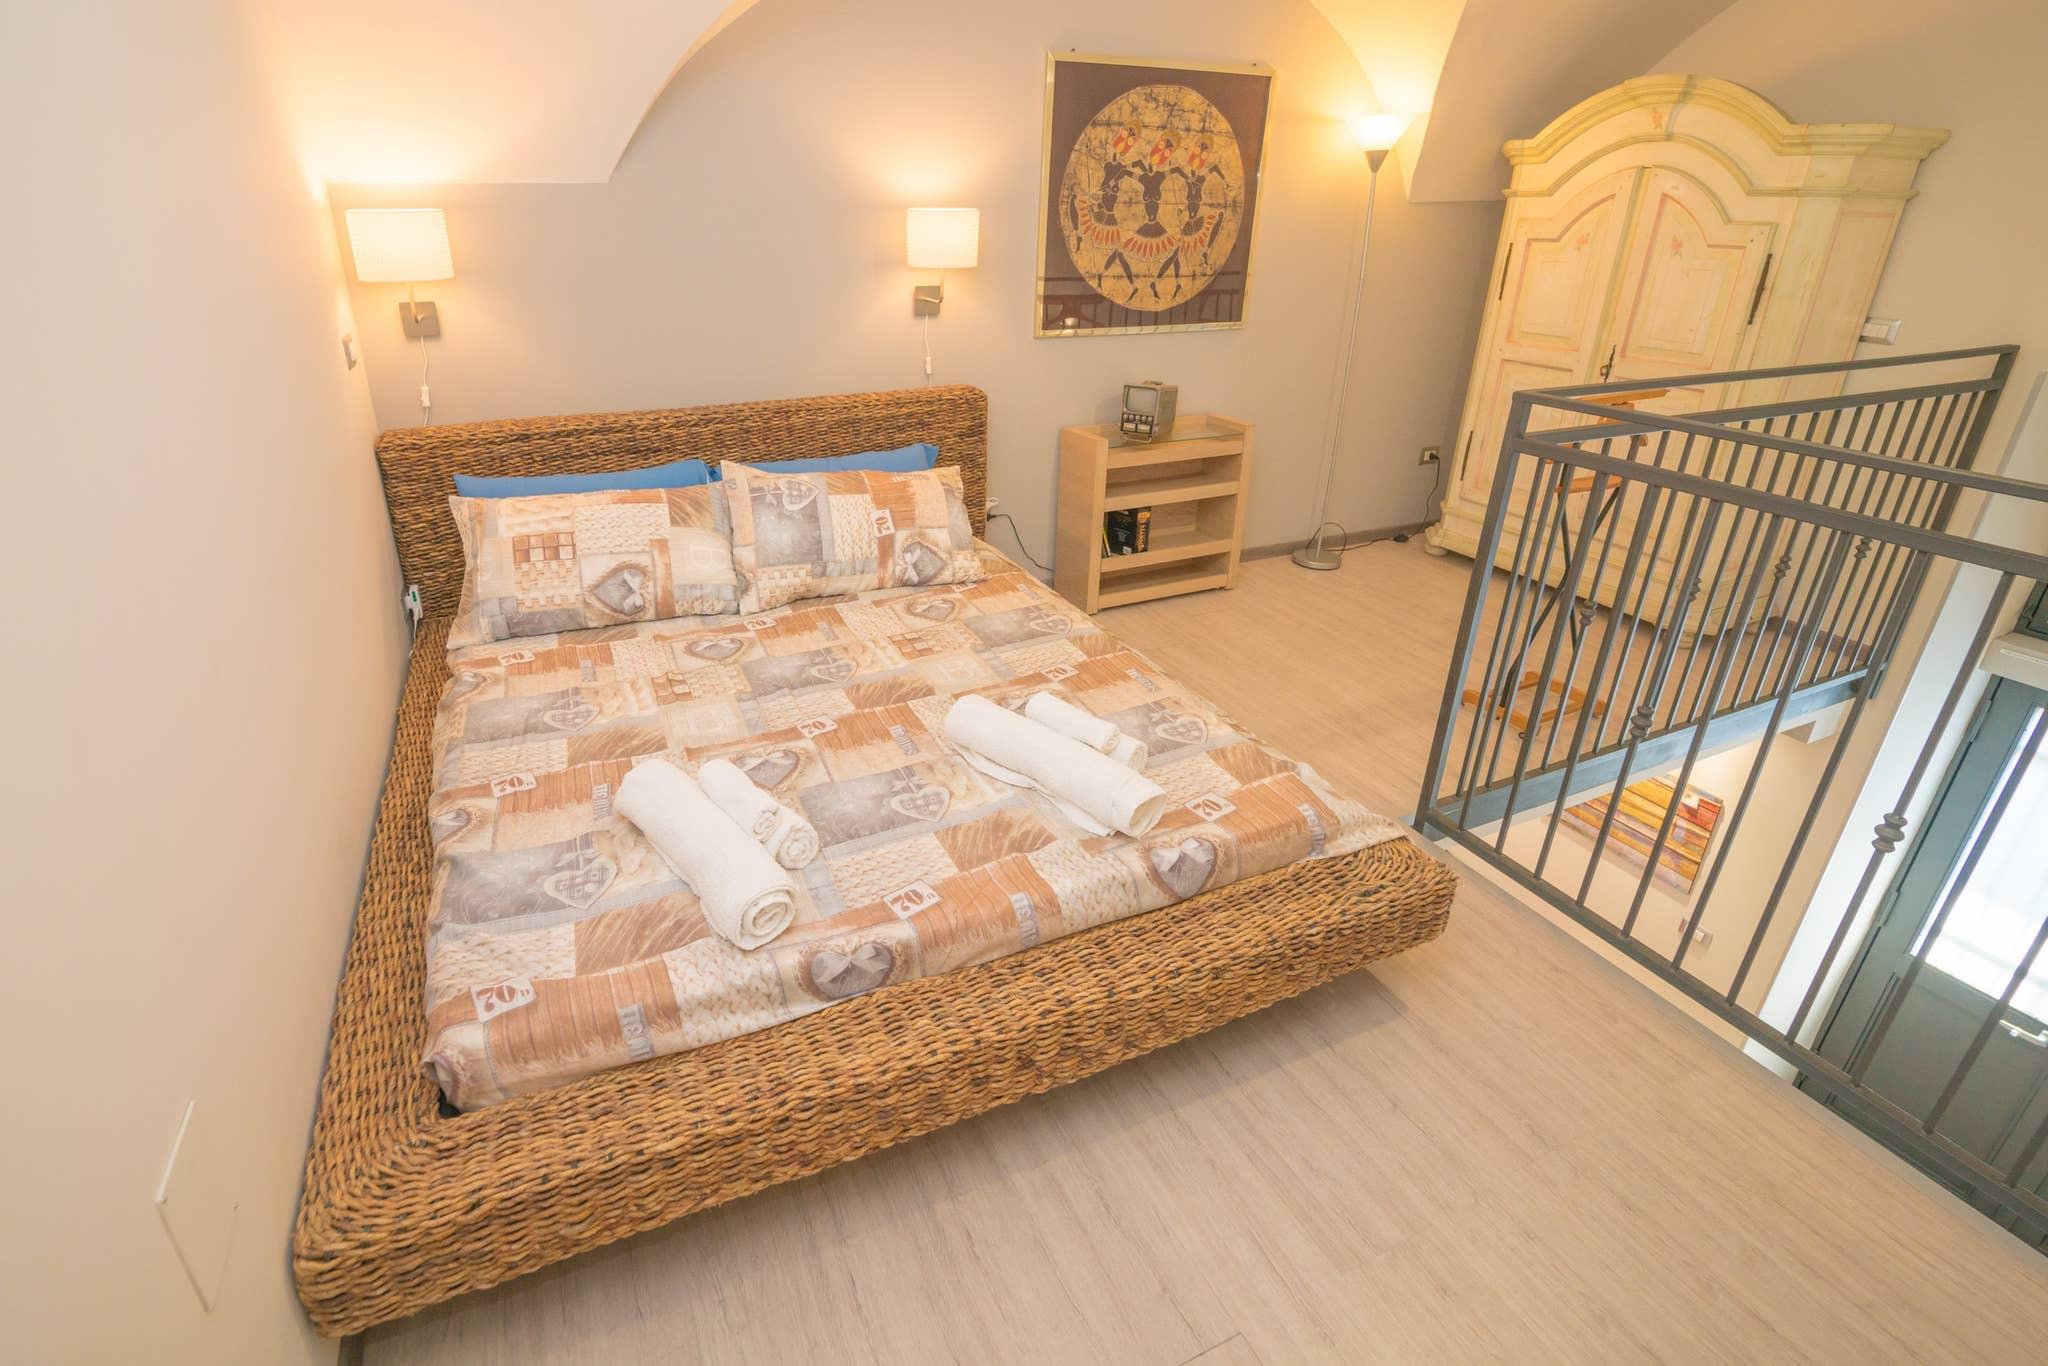 Maison de vacances  (2782175), Catania, Catania, Sicile, Italie, image 14